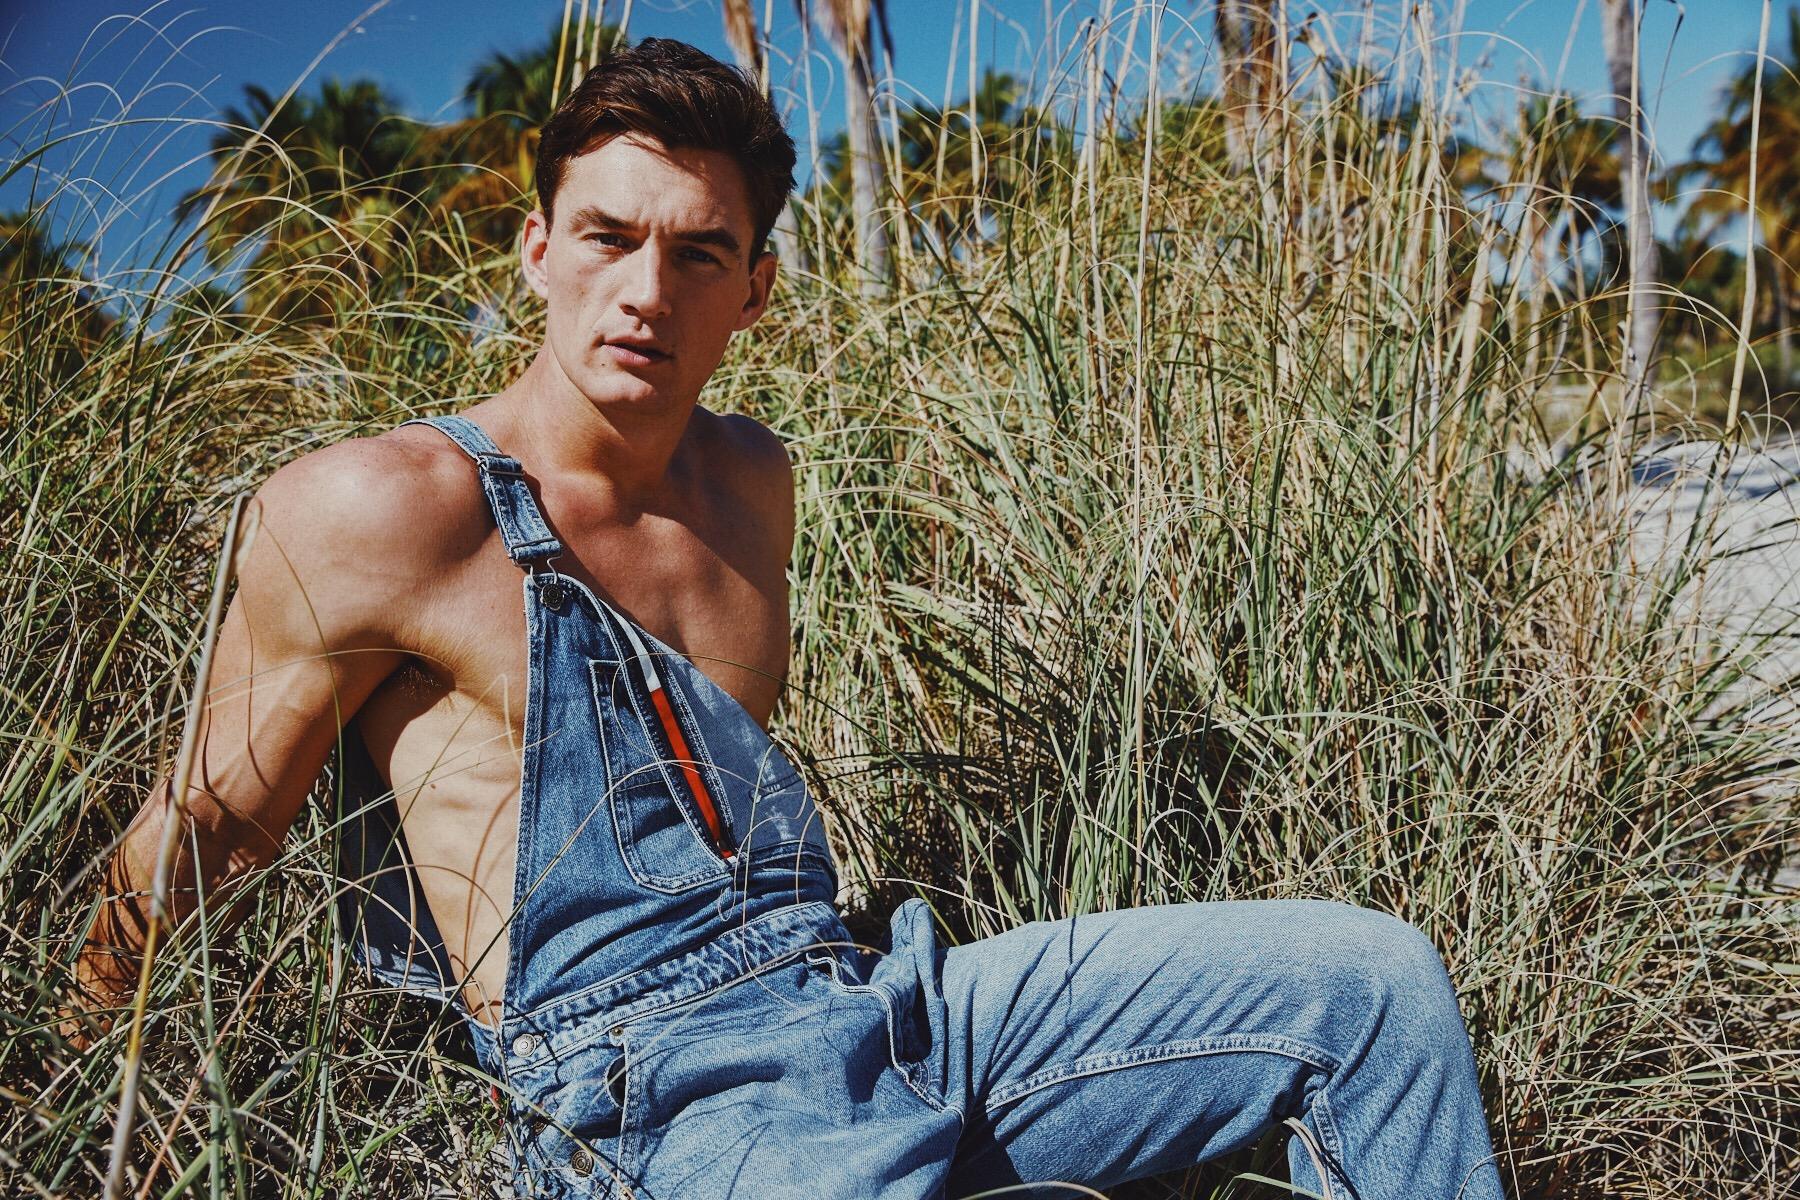 Harvey Nichols - Summer '19 Campaign   Photographer: Pip Cowley Producer: Matthew Webb Stylist: Luke Ross